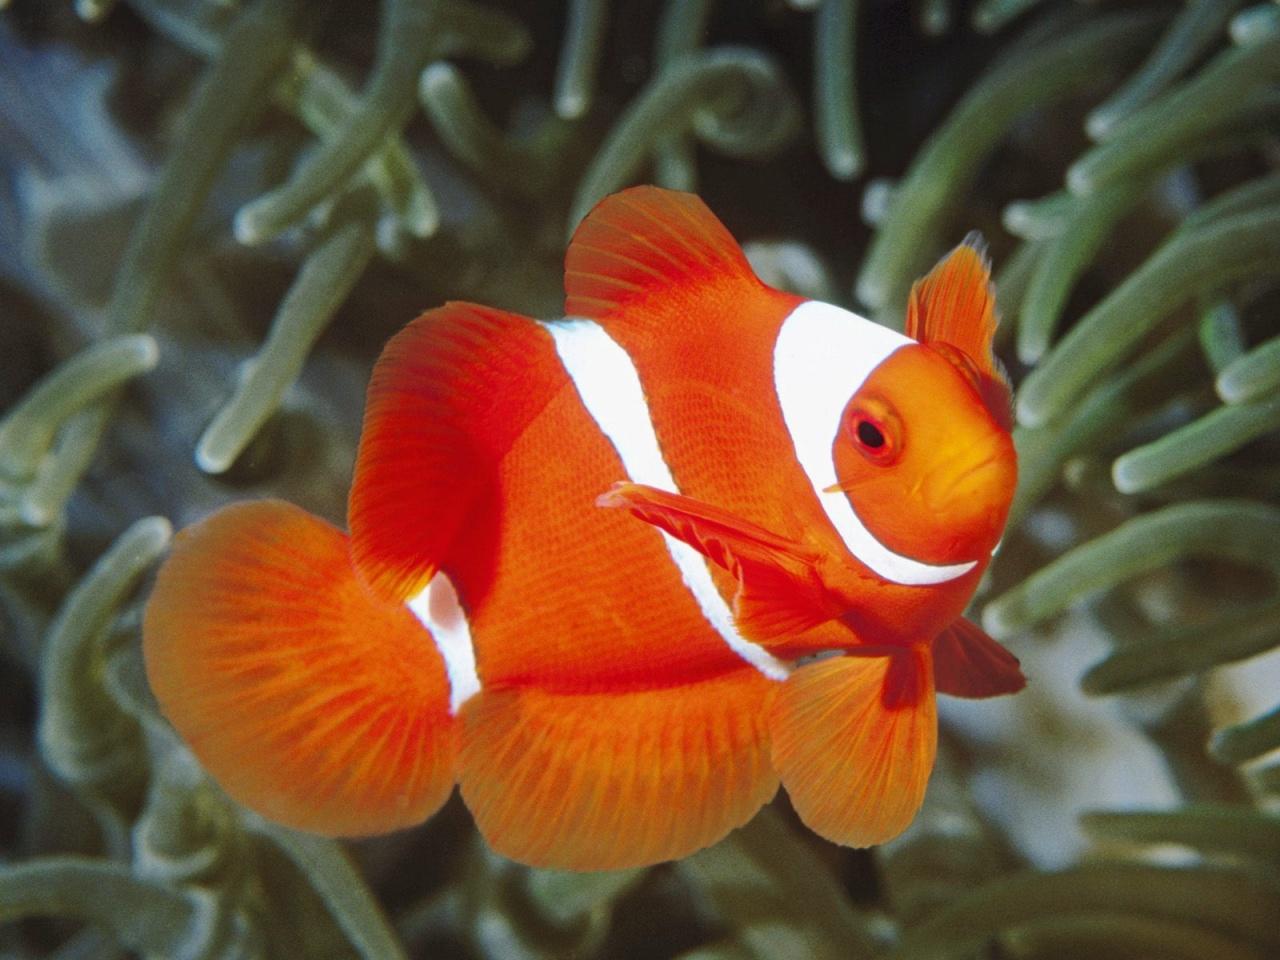 white-and-orange-fish-wallpapers_11723_1280x960.jpg